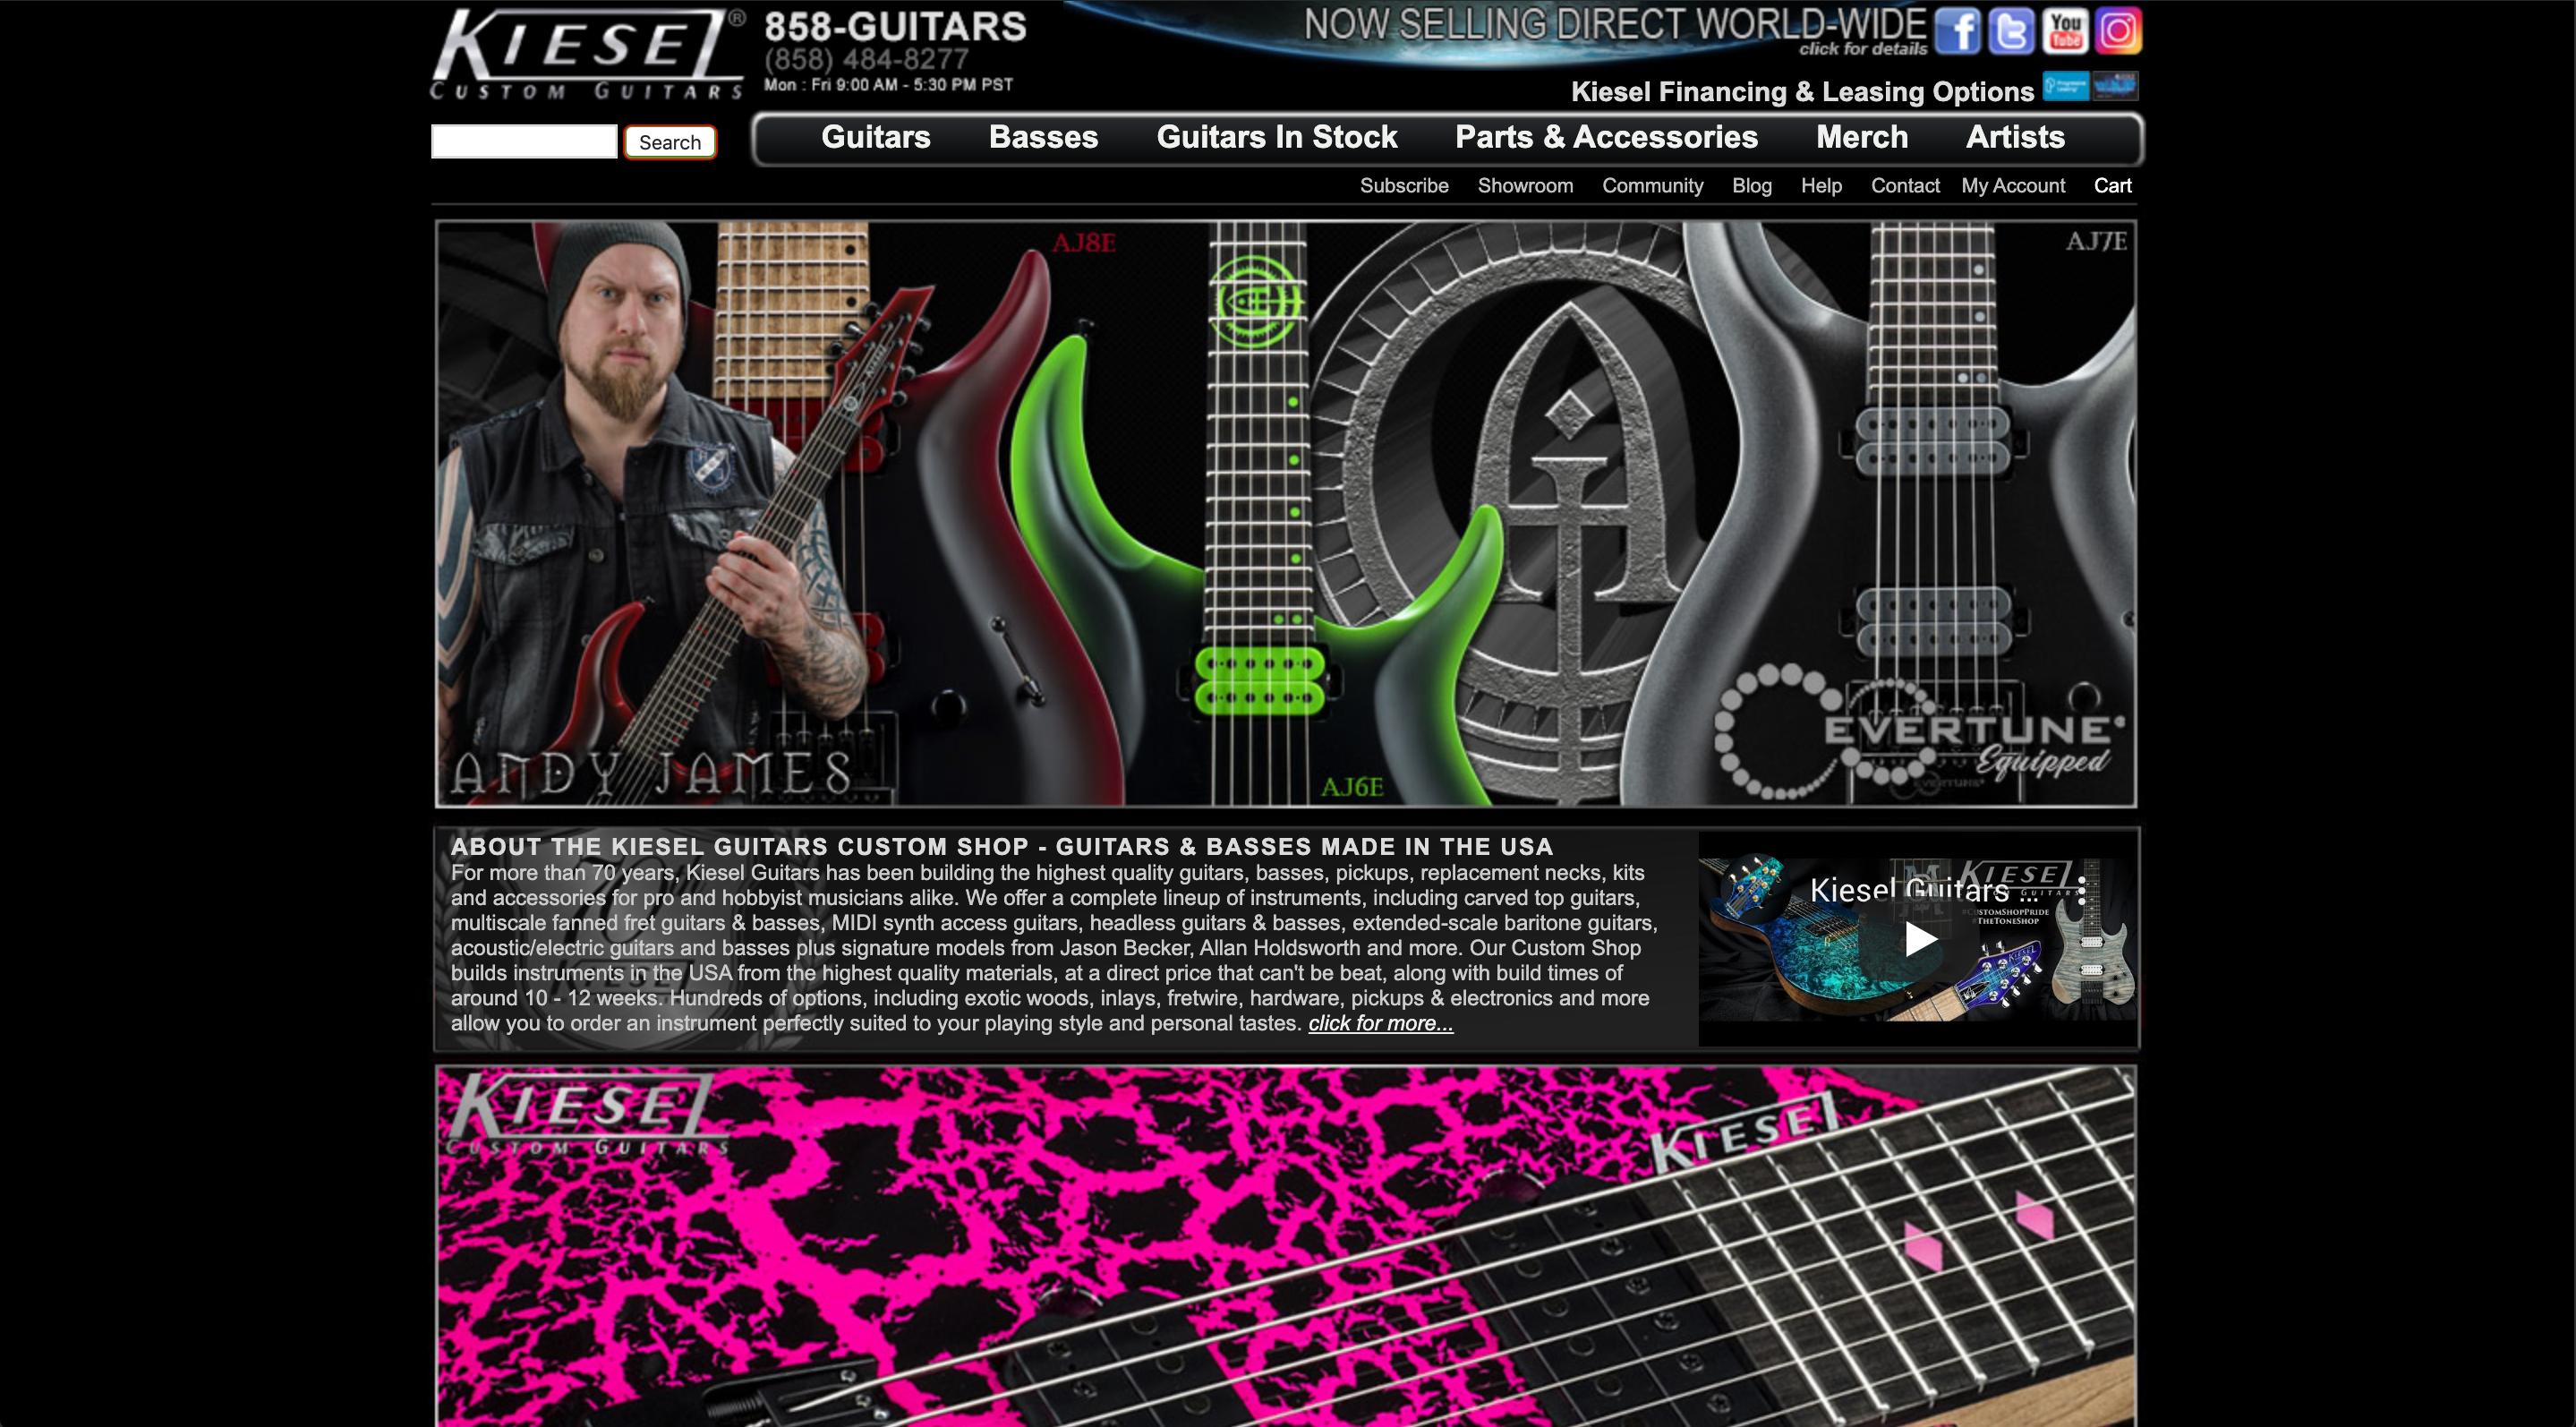 Kiesel guitars' old website (picture 1)